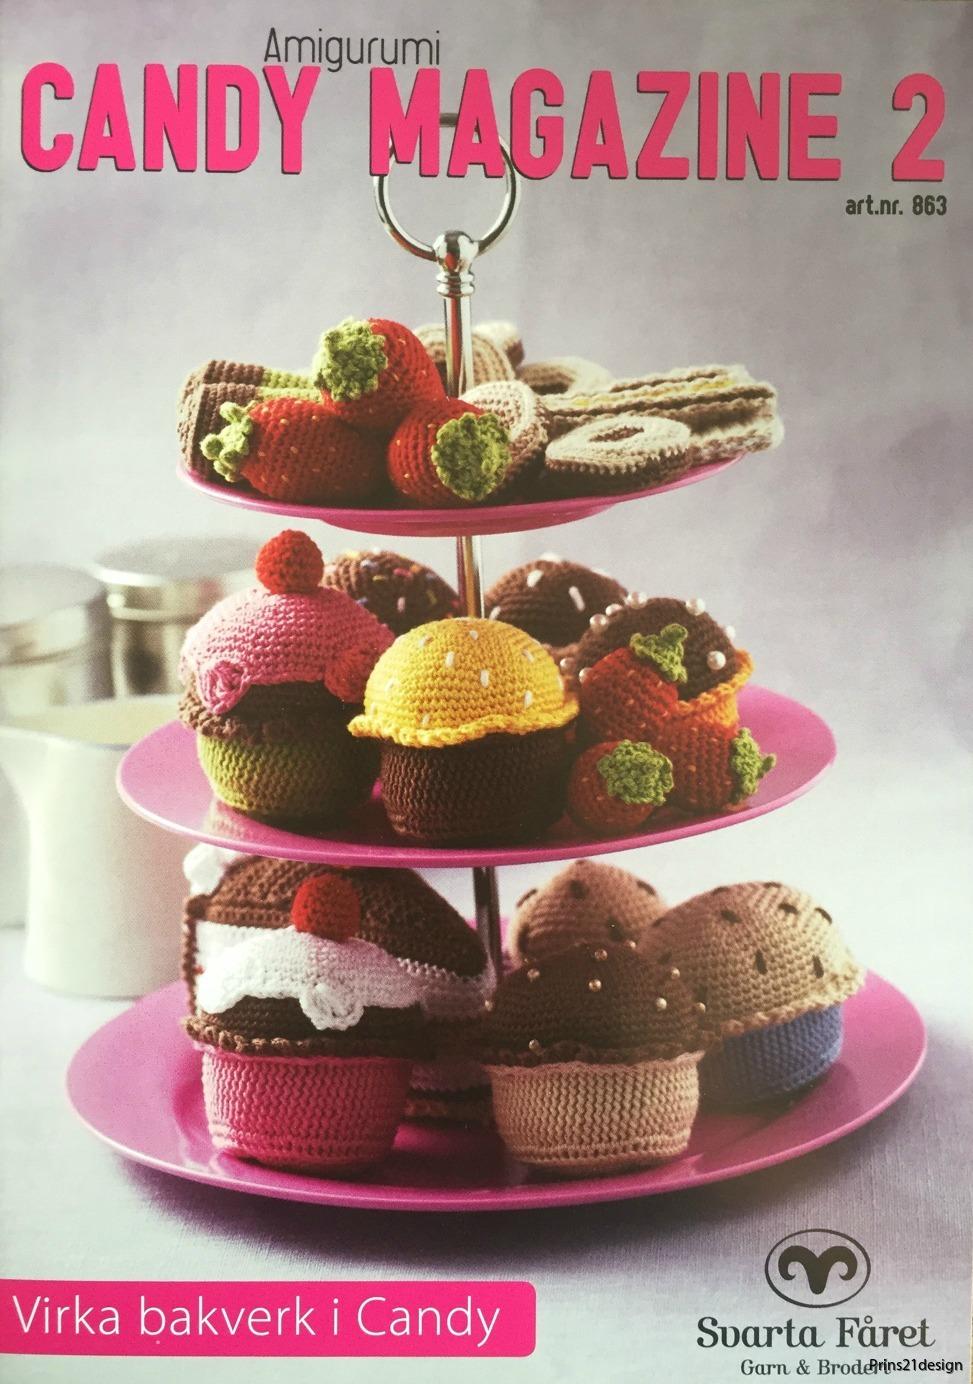 Candy magazine2